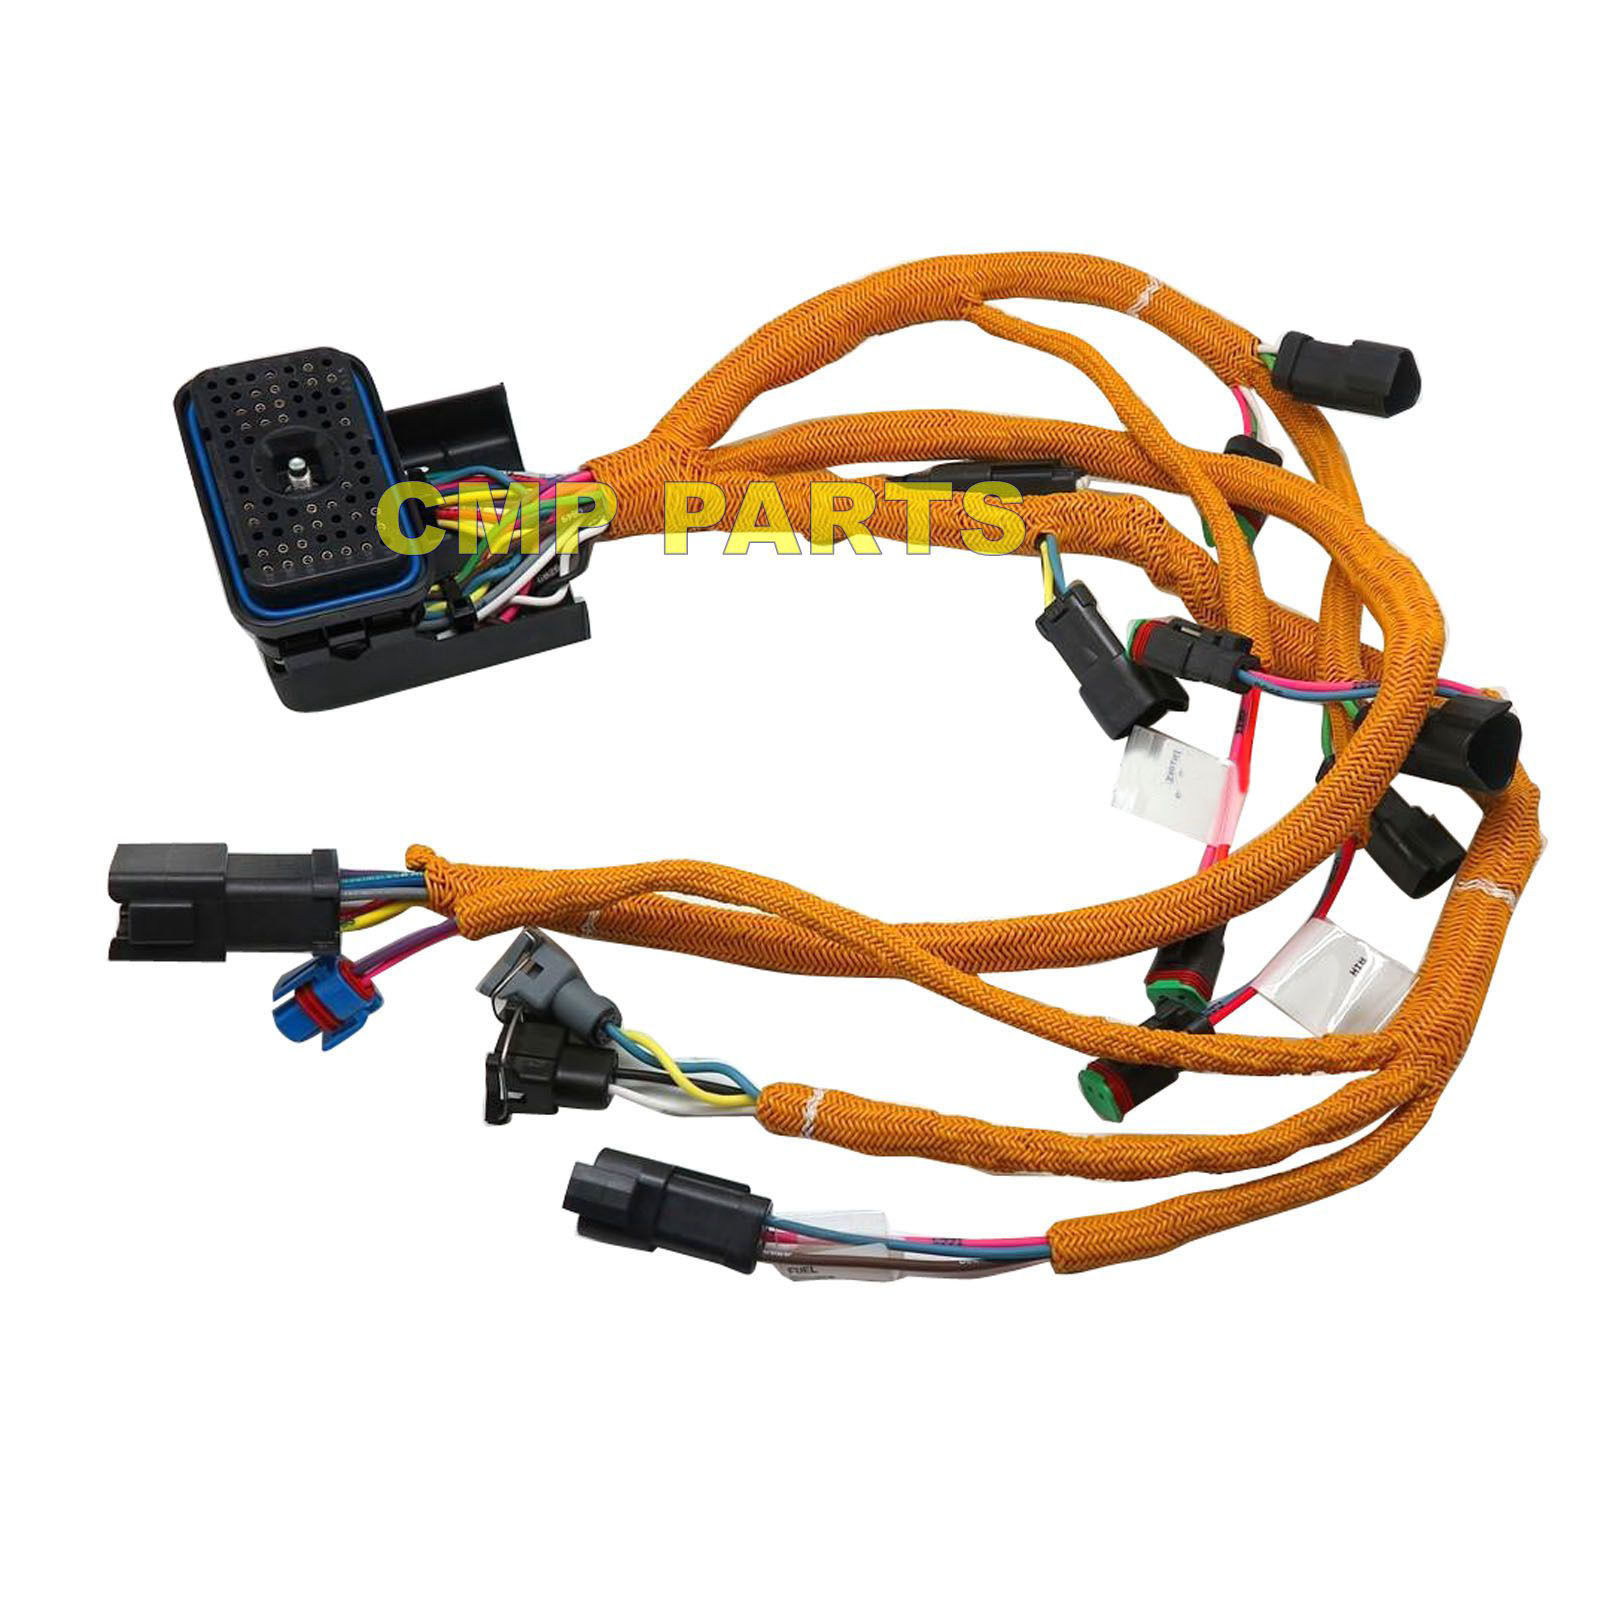 Motor Kablo Demeti 190-5038 1905038 Uyar 325C 322C 320C E325C E322C E320C 1 Yıl Garanti Ile